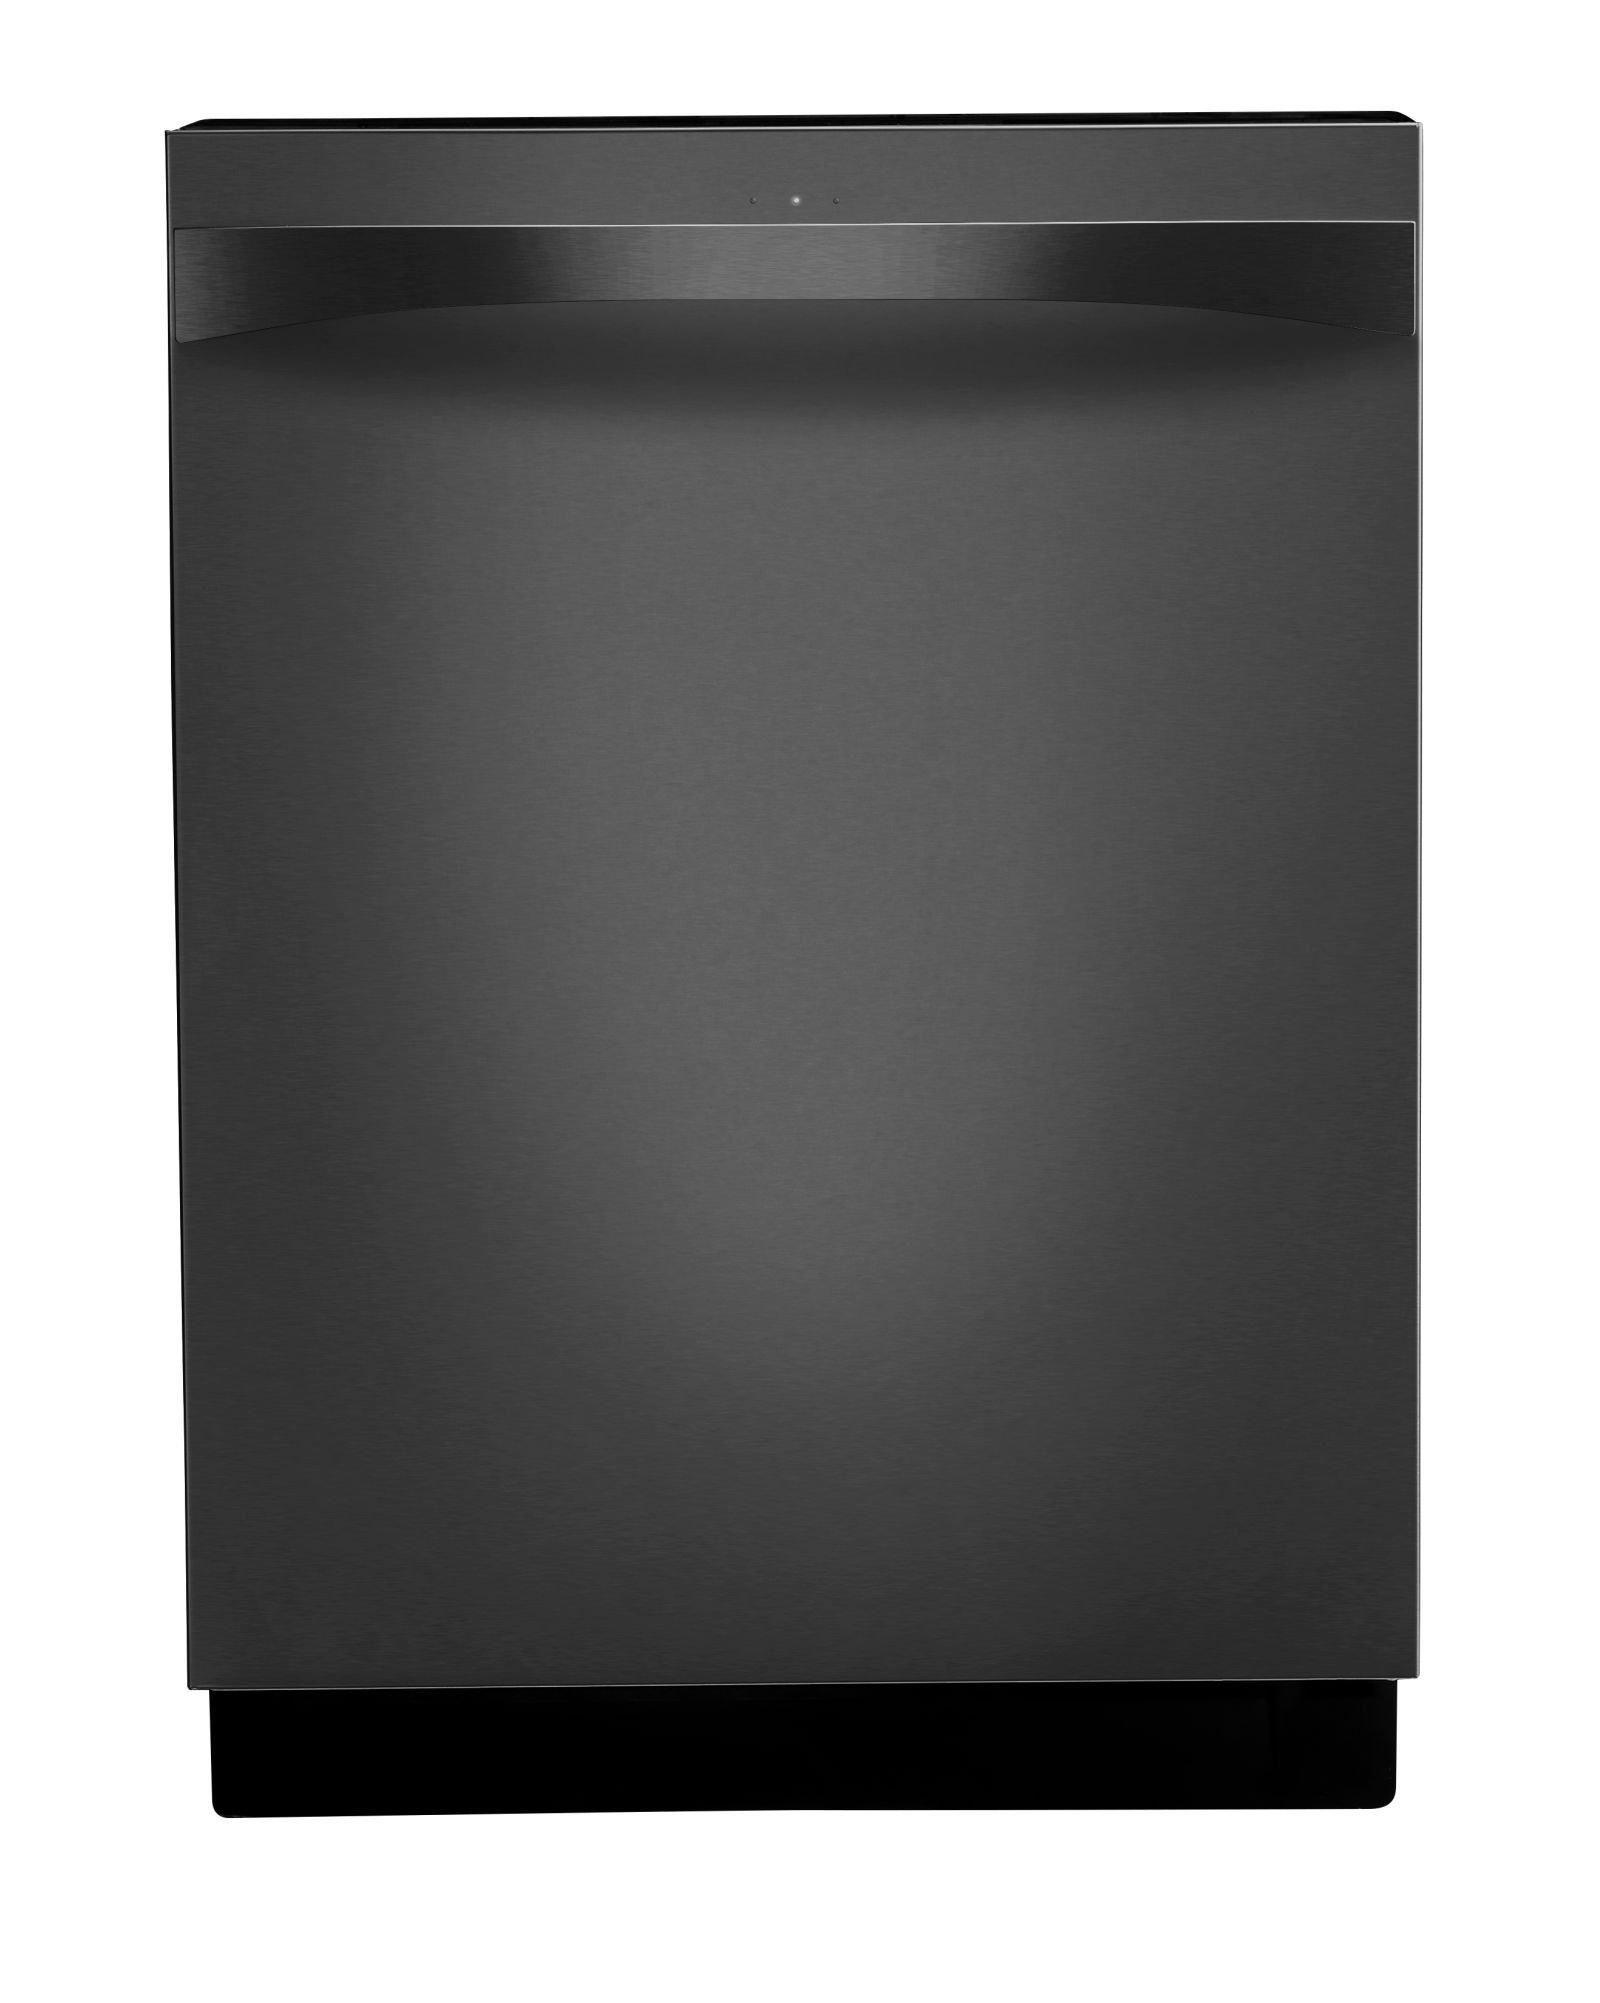 Kenmore 14677 SMART Dishwasher with 360° PowerWash, Stainless Steel